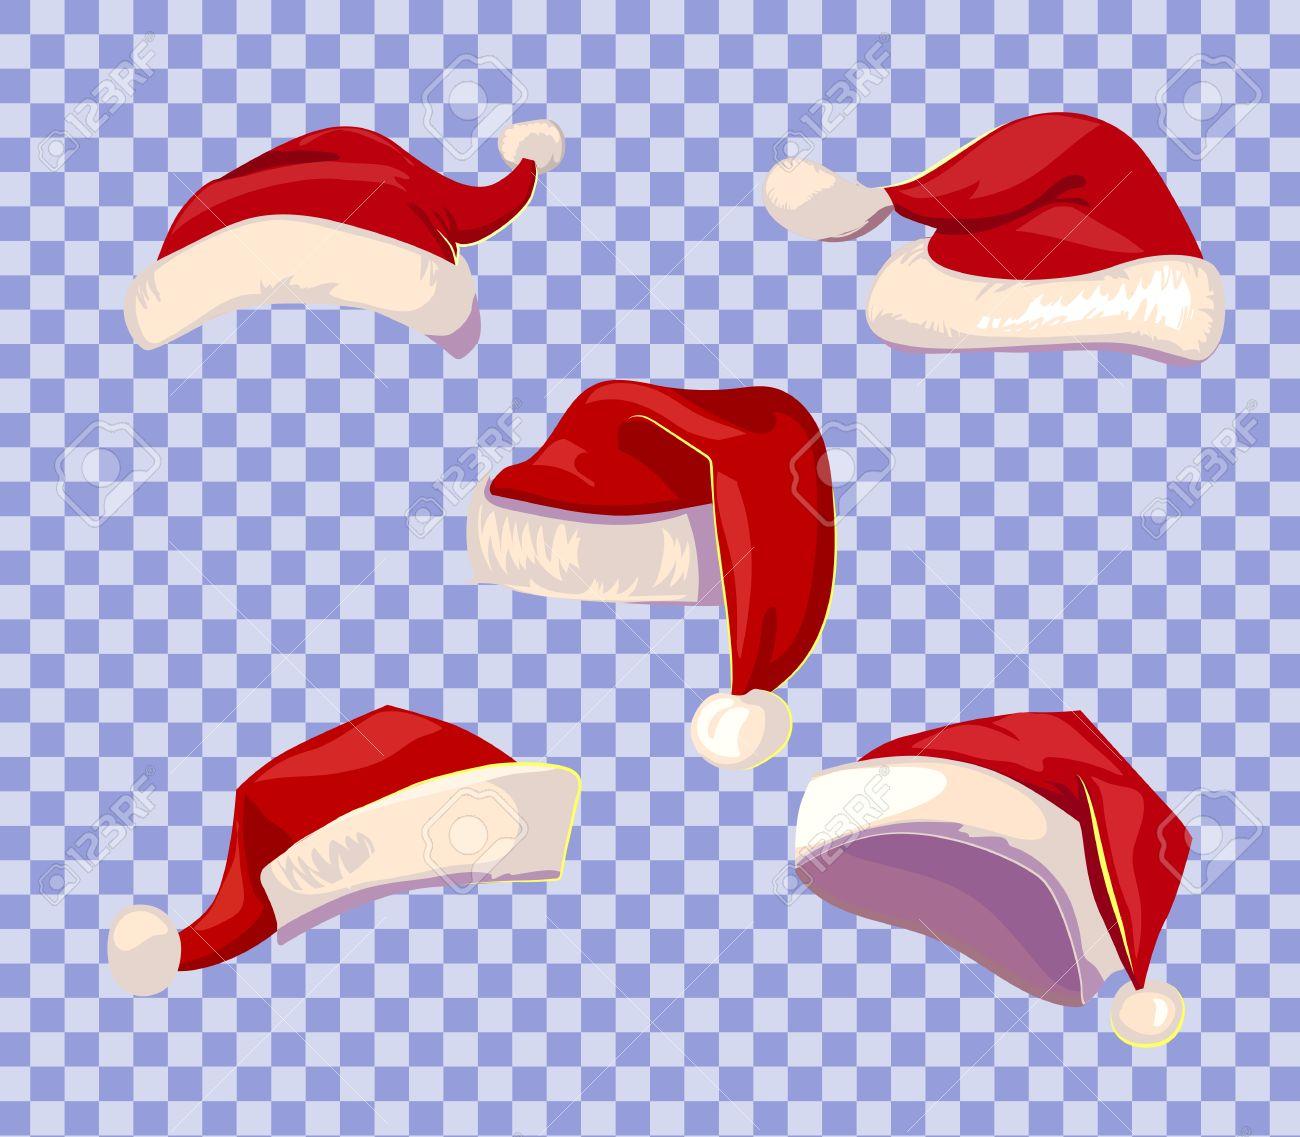 Cartoone style Santa hats set on transparent background. - 64241096